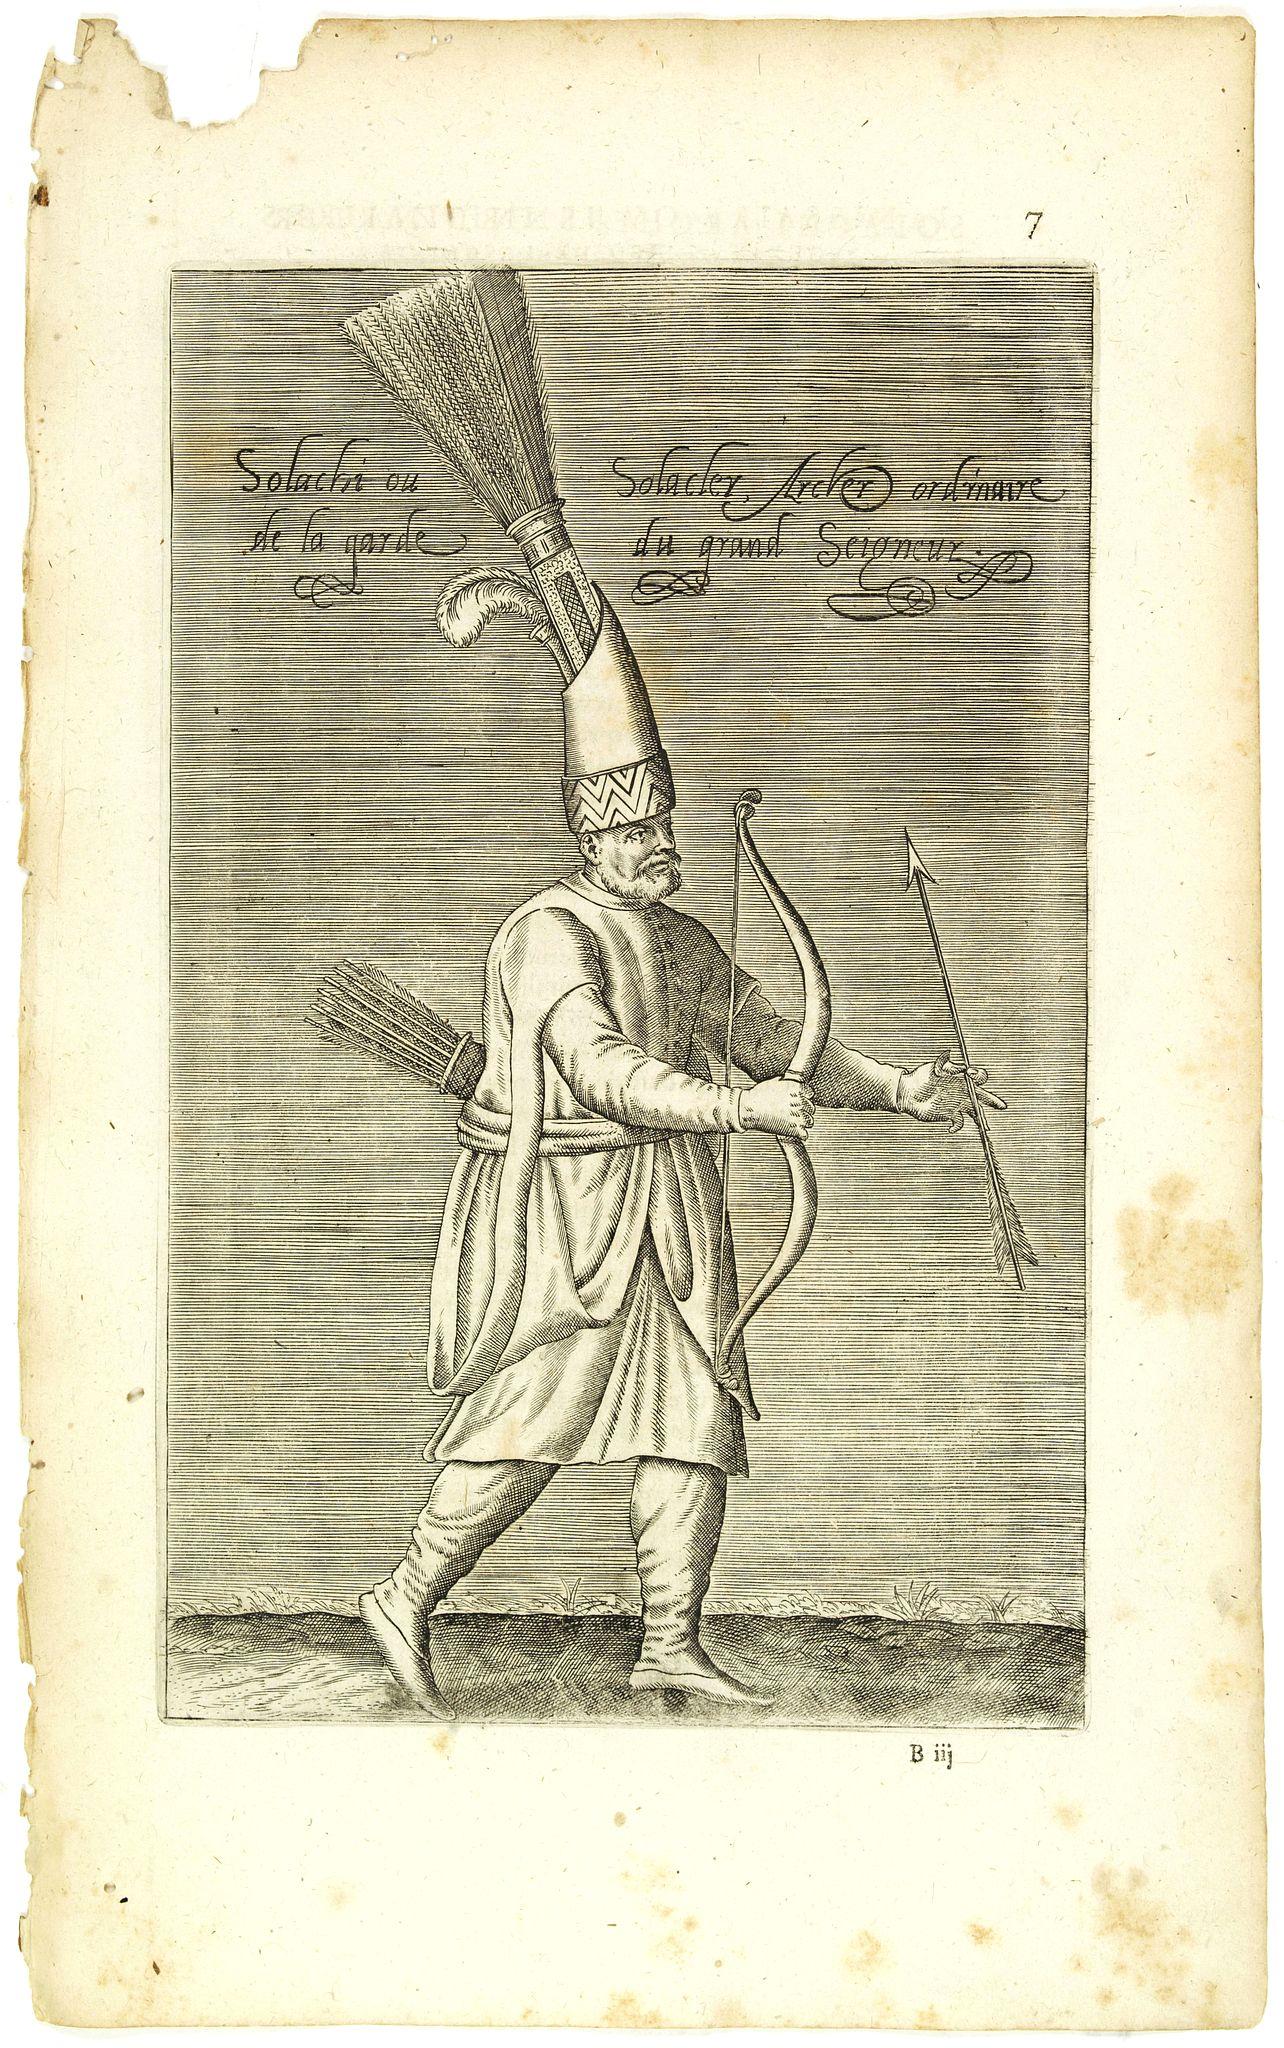 NICOLAS DE NICOLAY, Thomas Artus (sieur d'Embry). -  Solachi ou Solacler, Archer Ordinaire de la Garde du Grand Seigneur. (7)